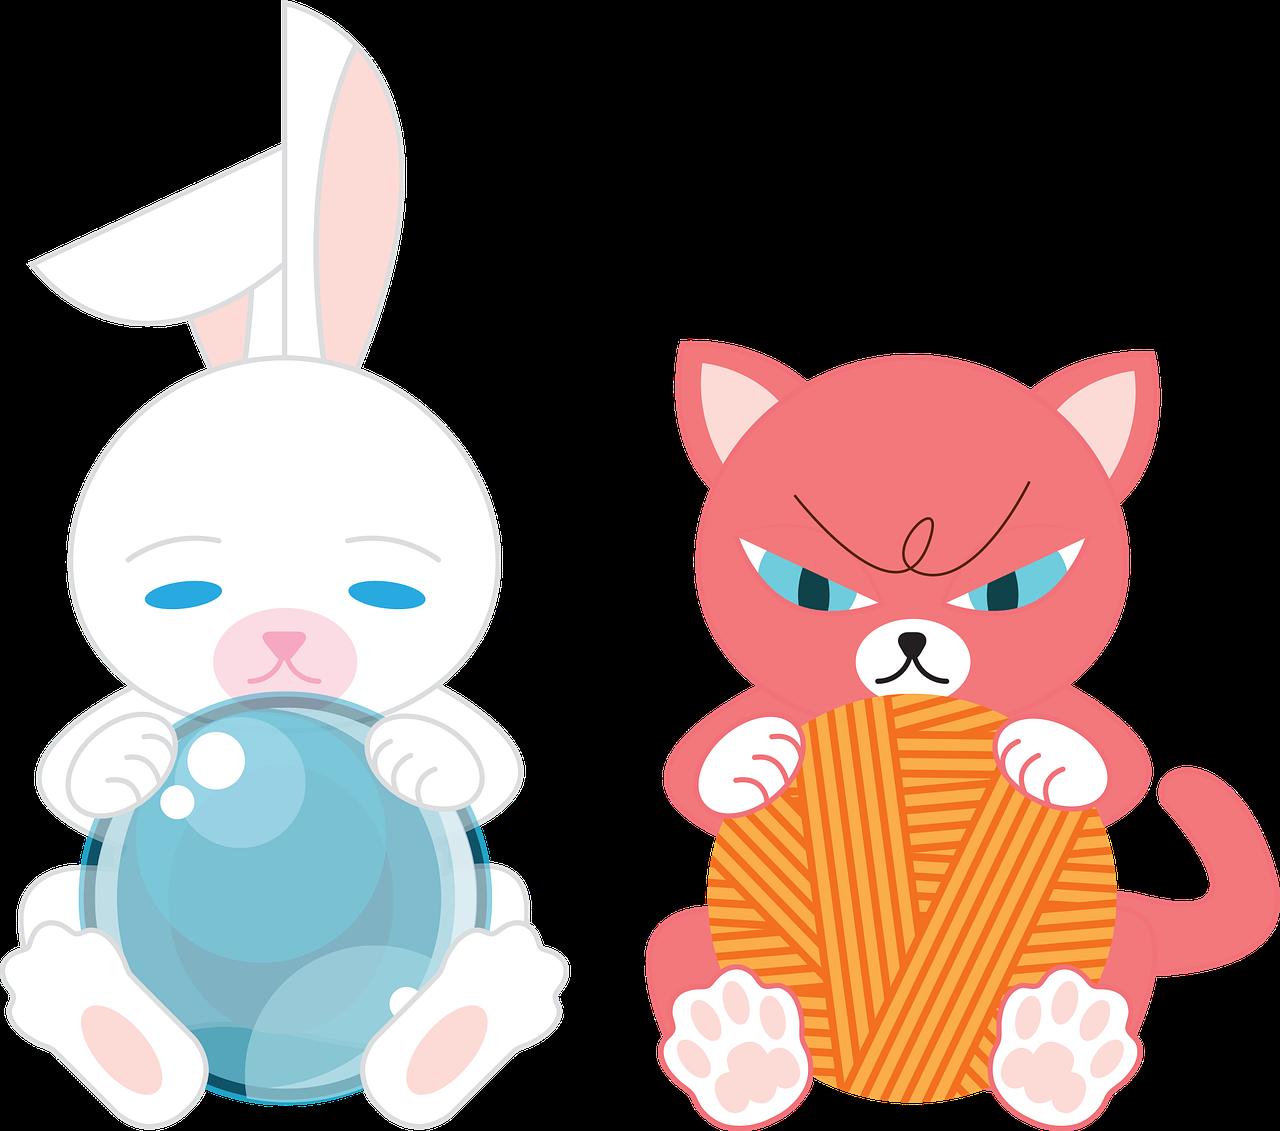 Rabbit Cat Animal Free Vector Graphic On Pixabay